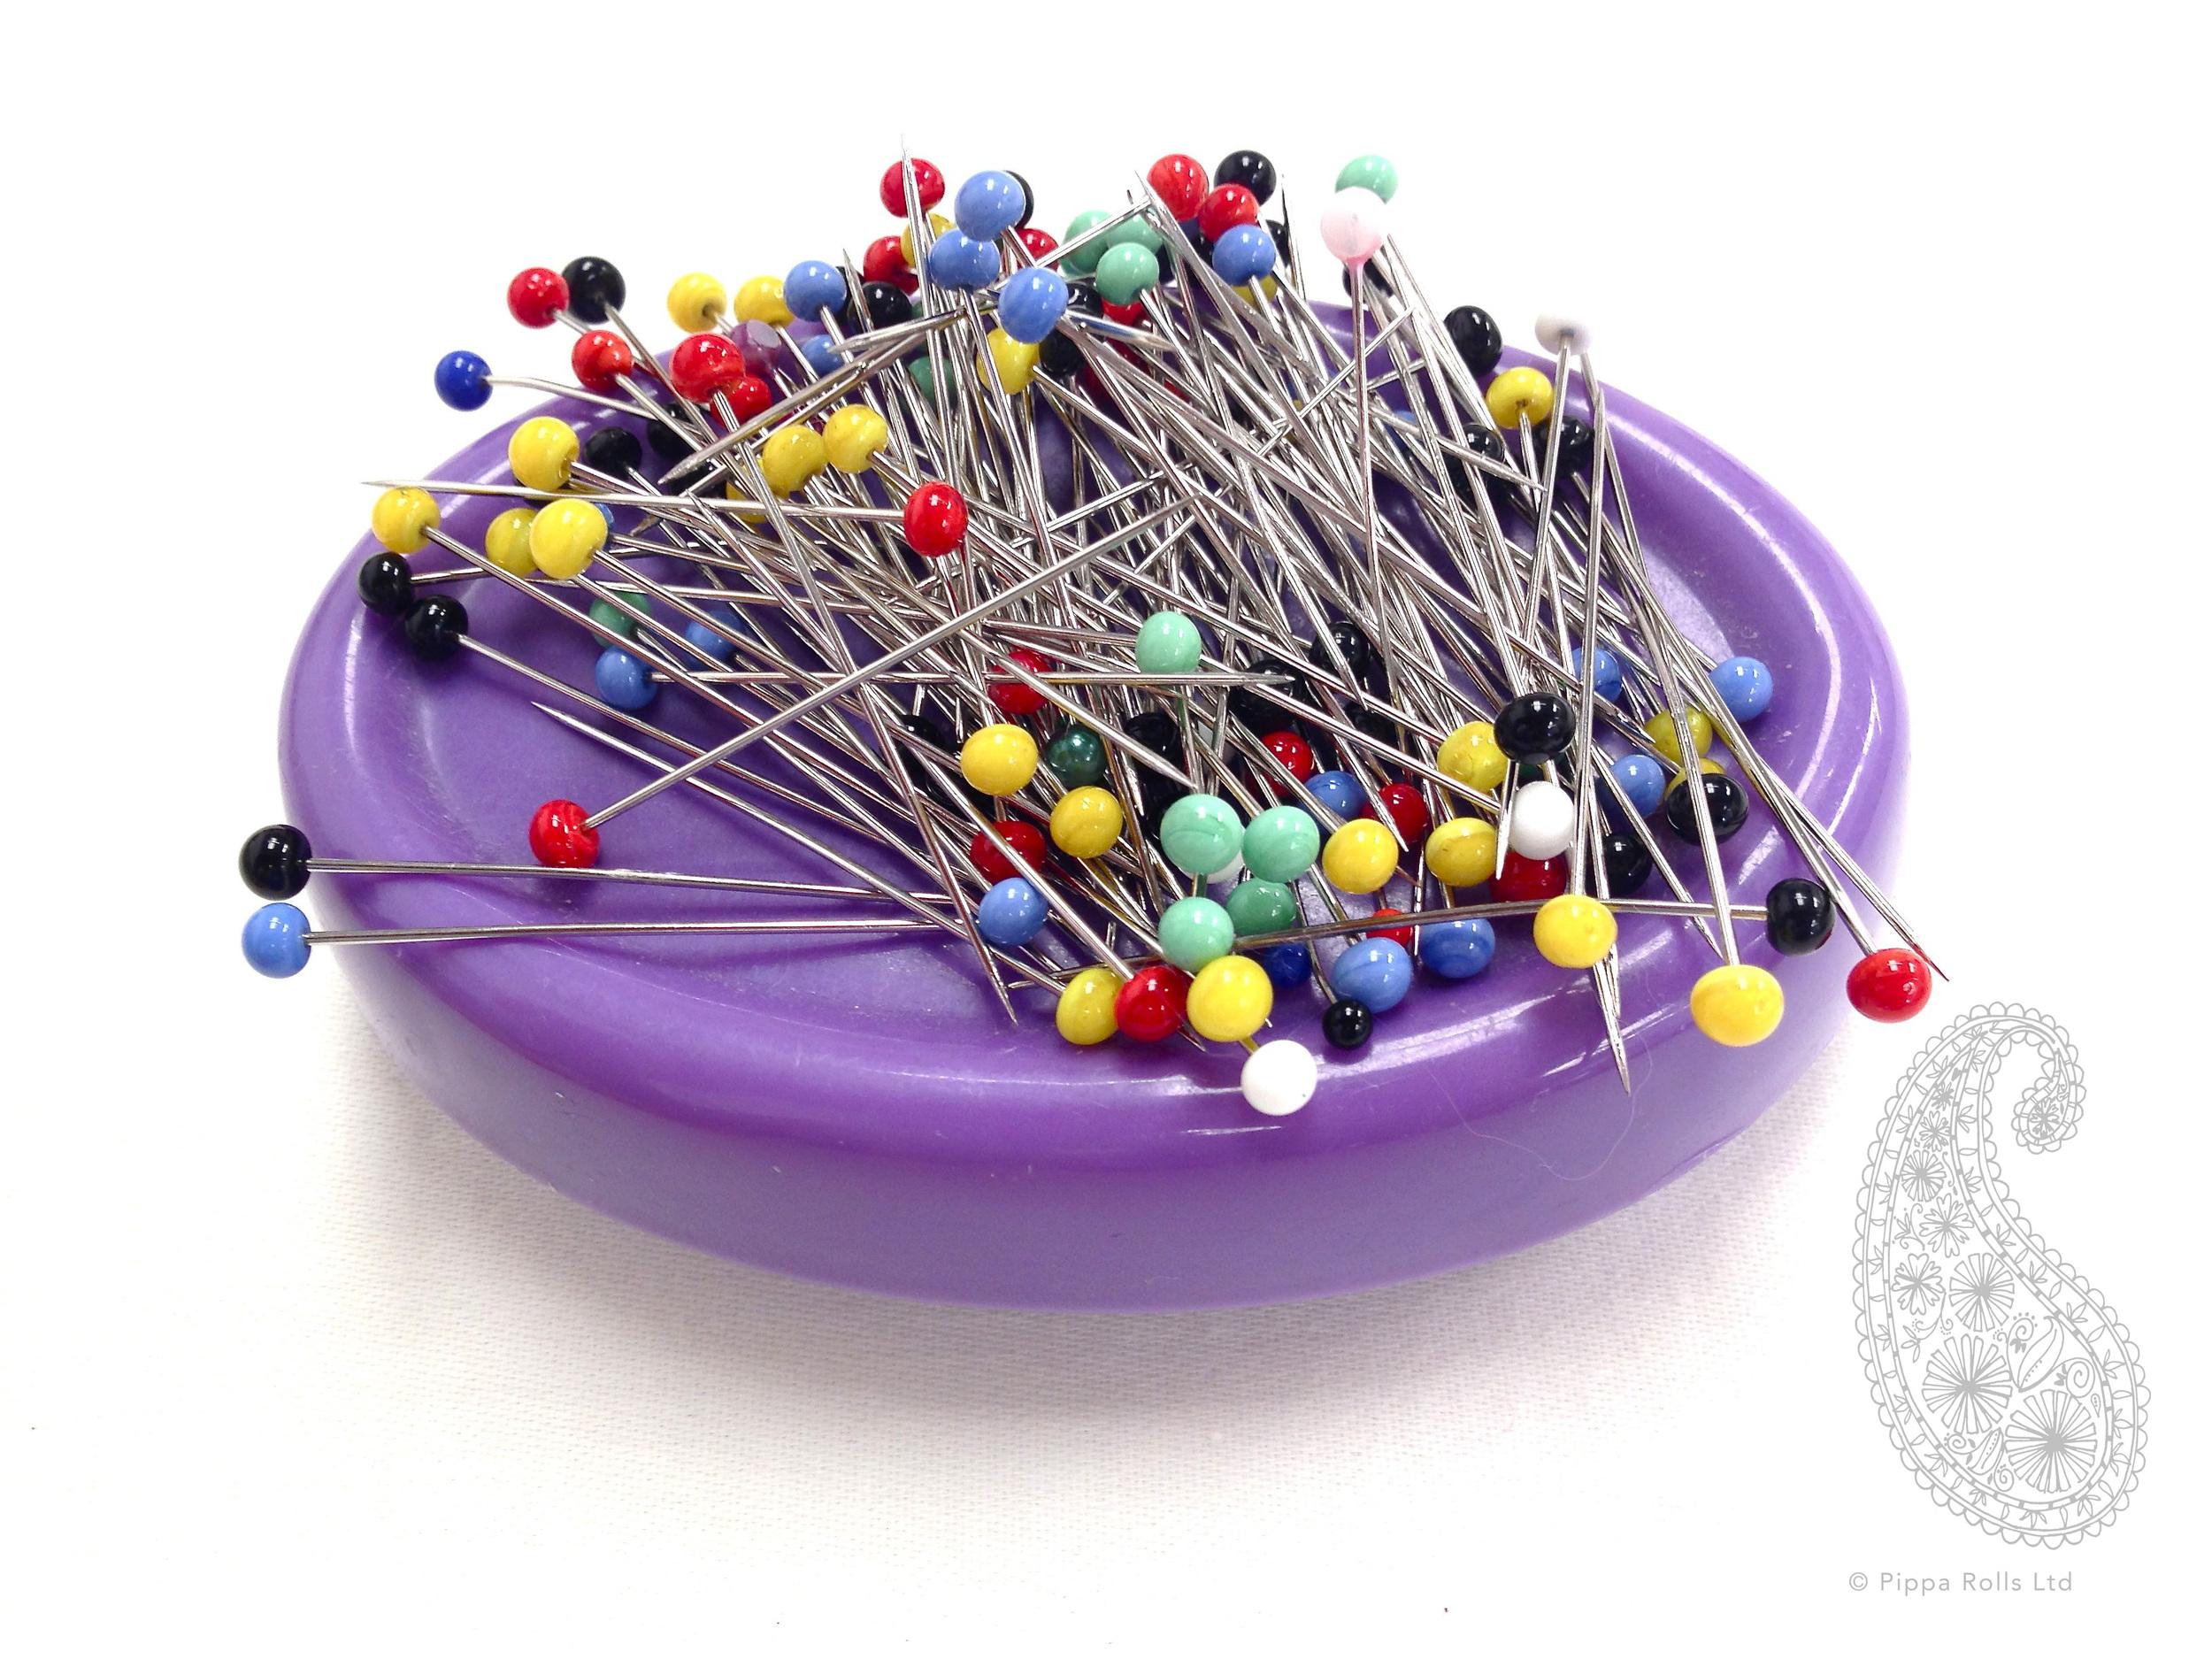 pins by Pippa Rolls Limited jpeg copy.jpg